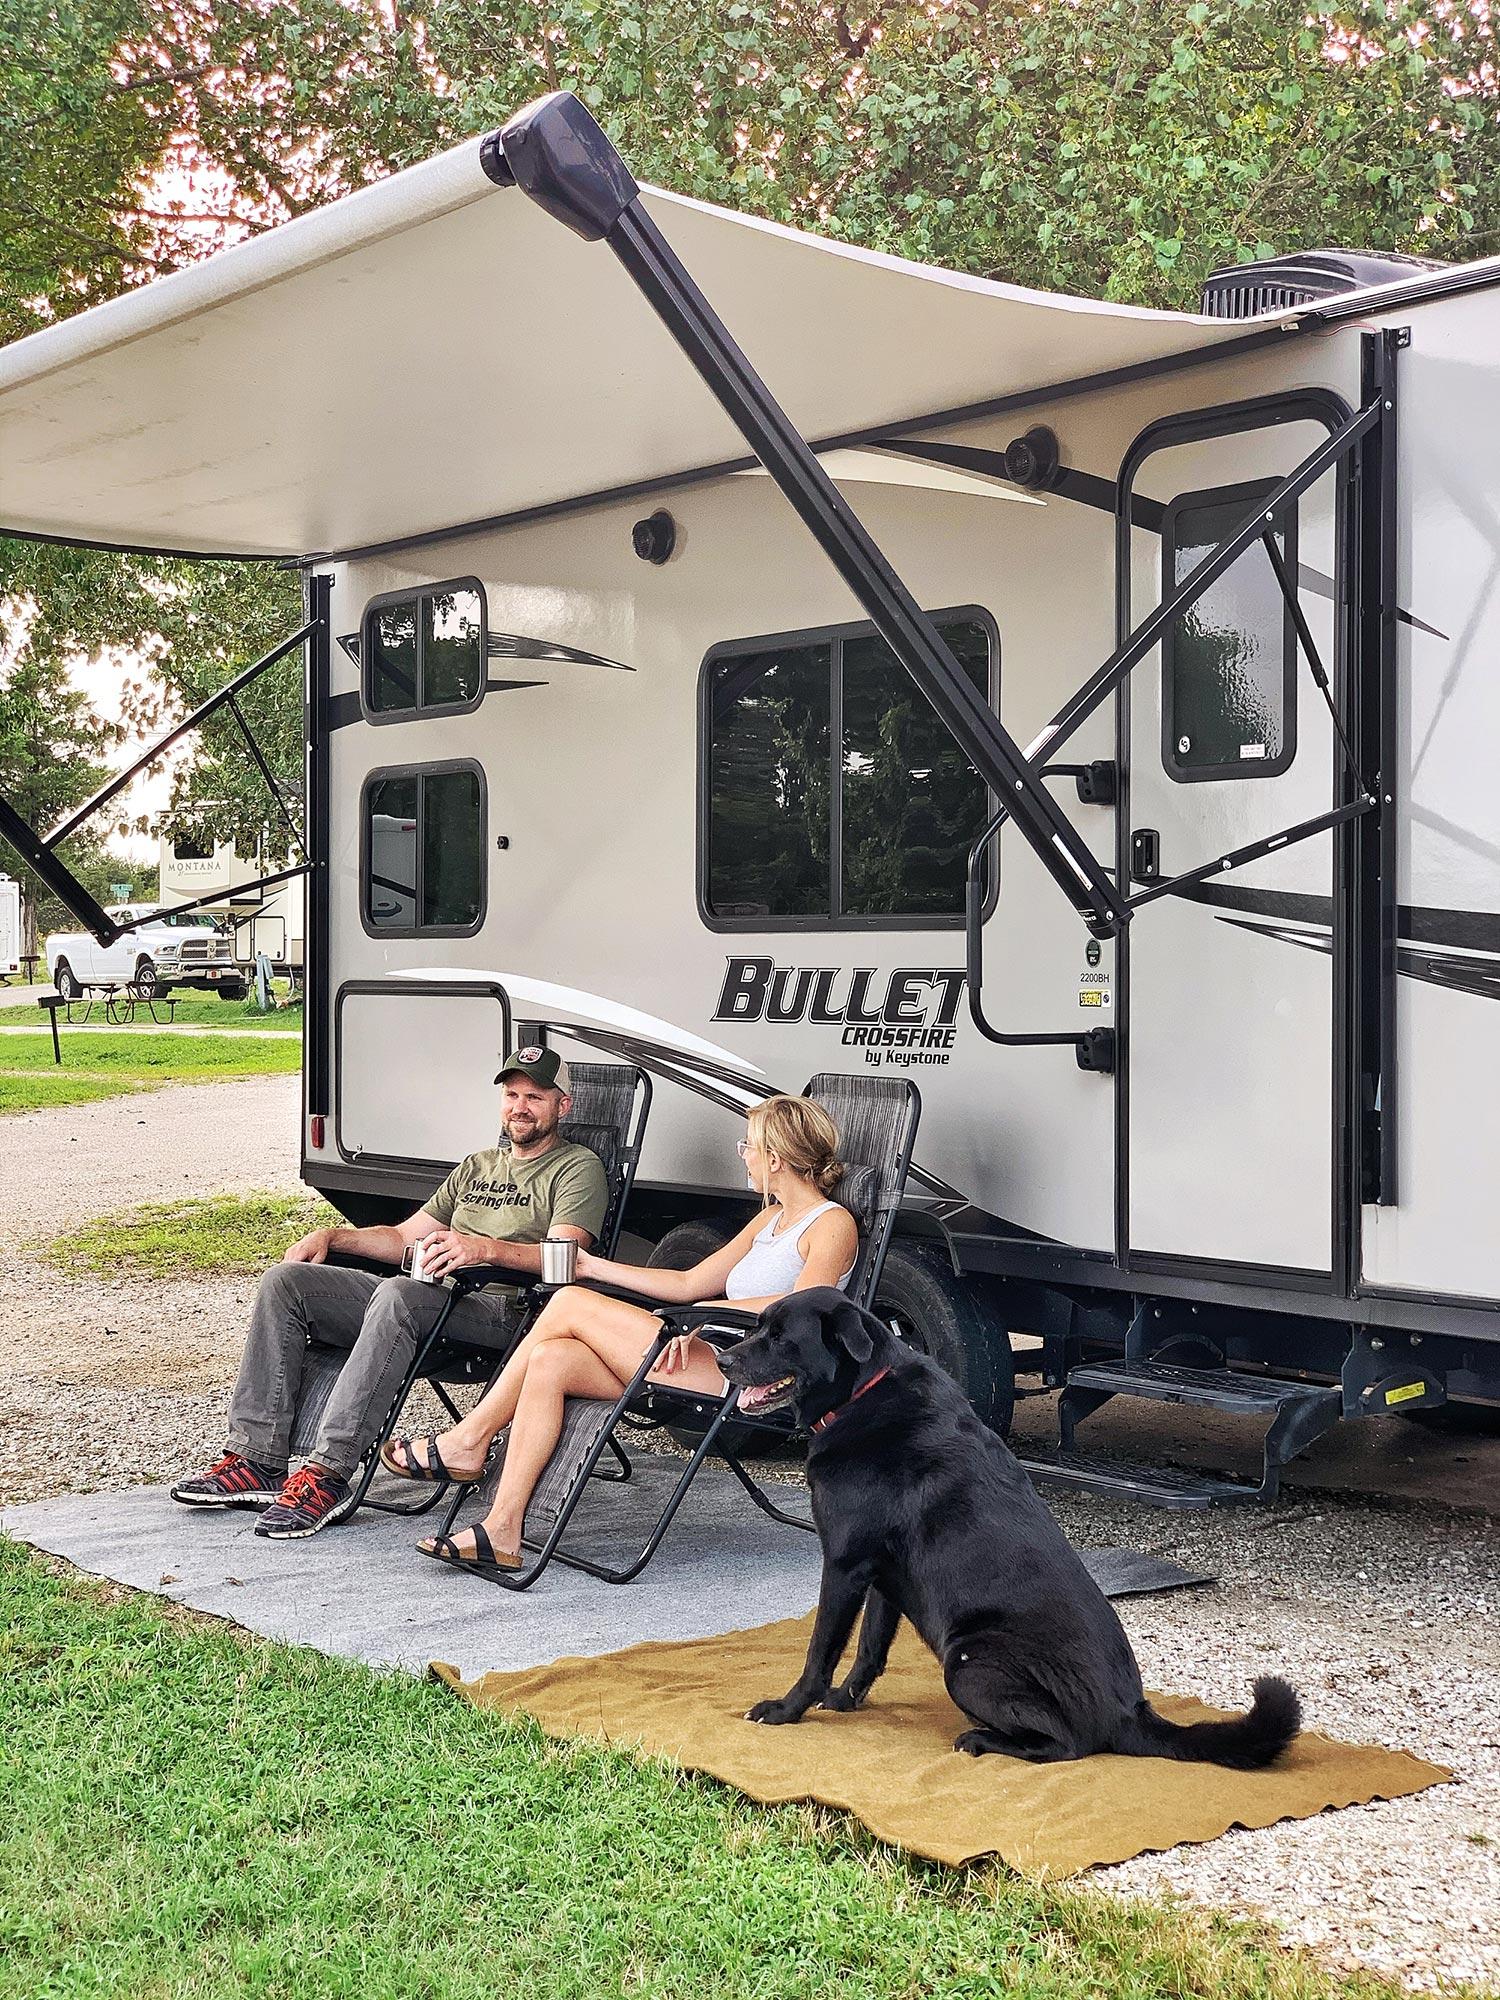 Camping. City Guide Springfield MO